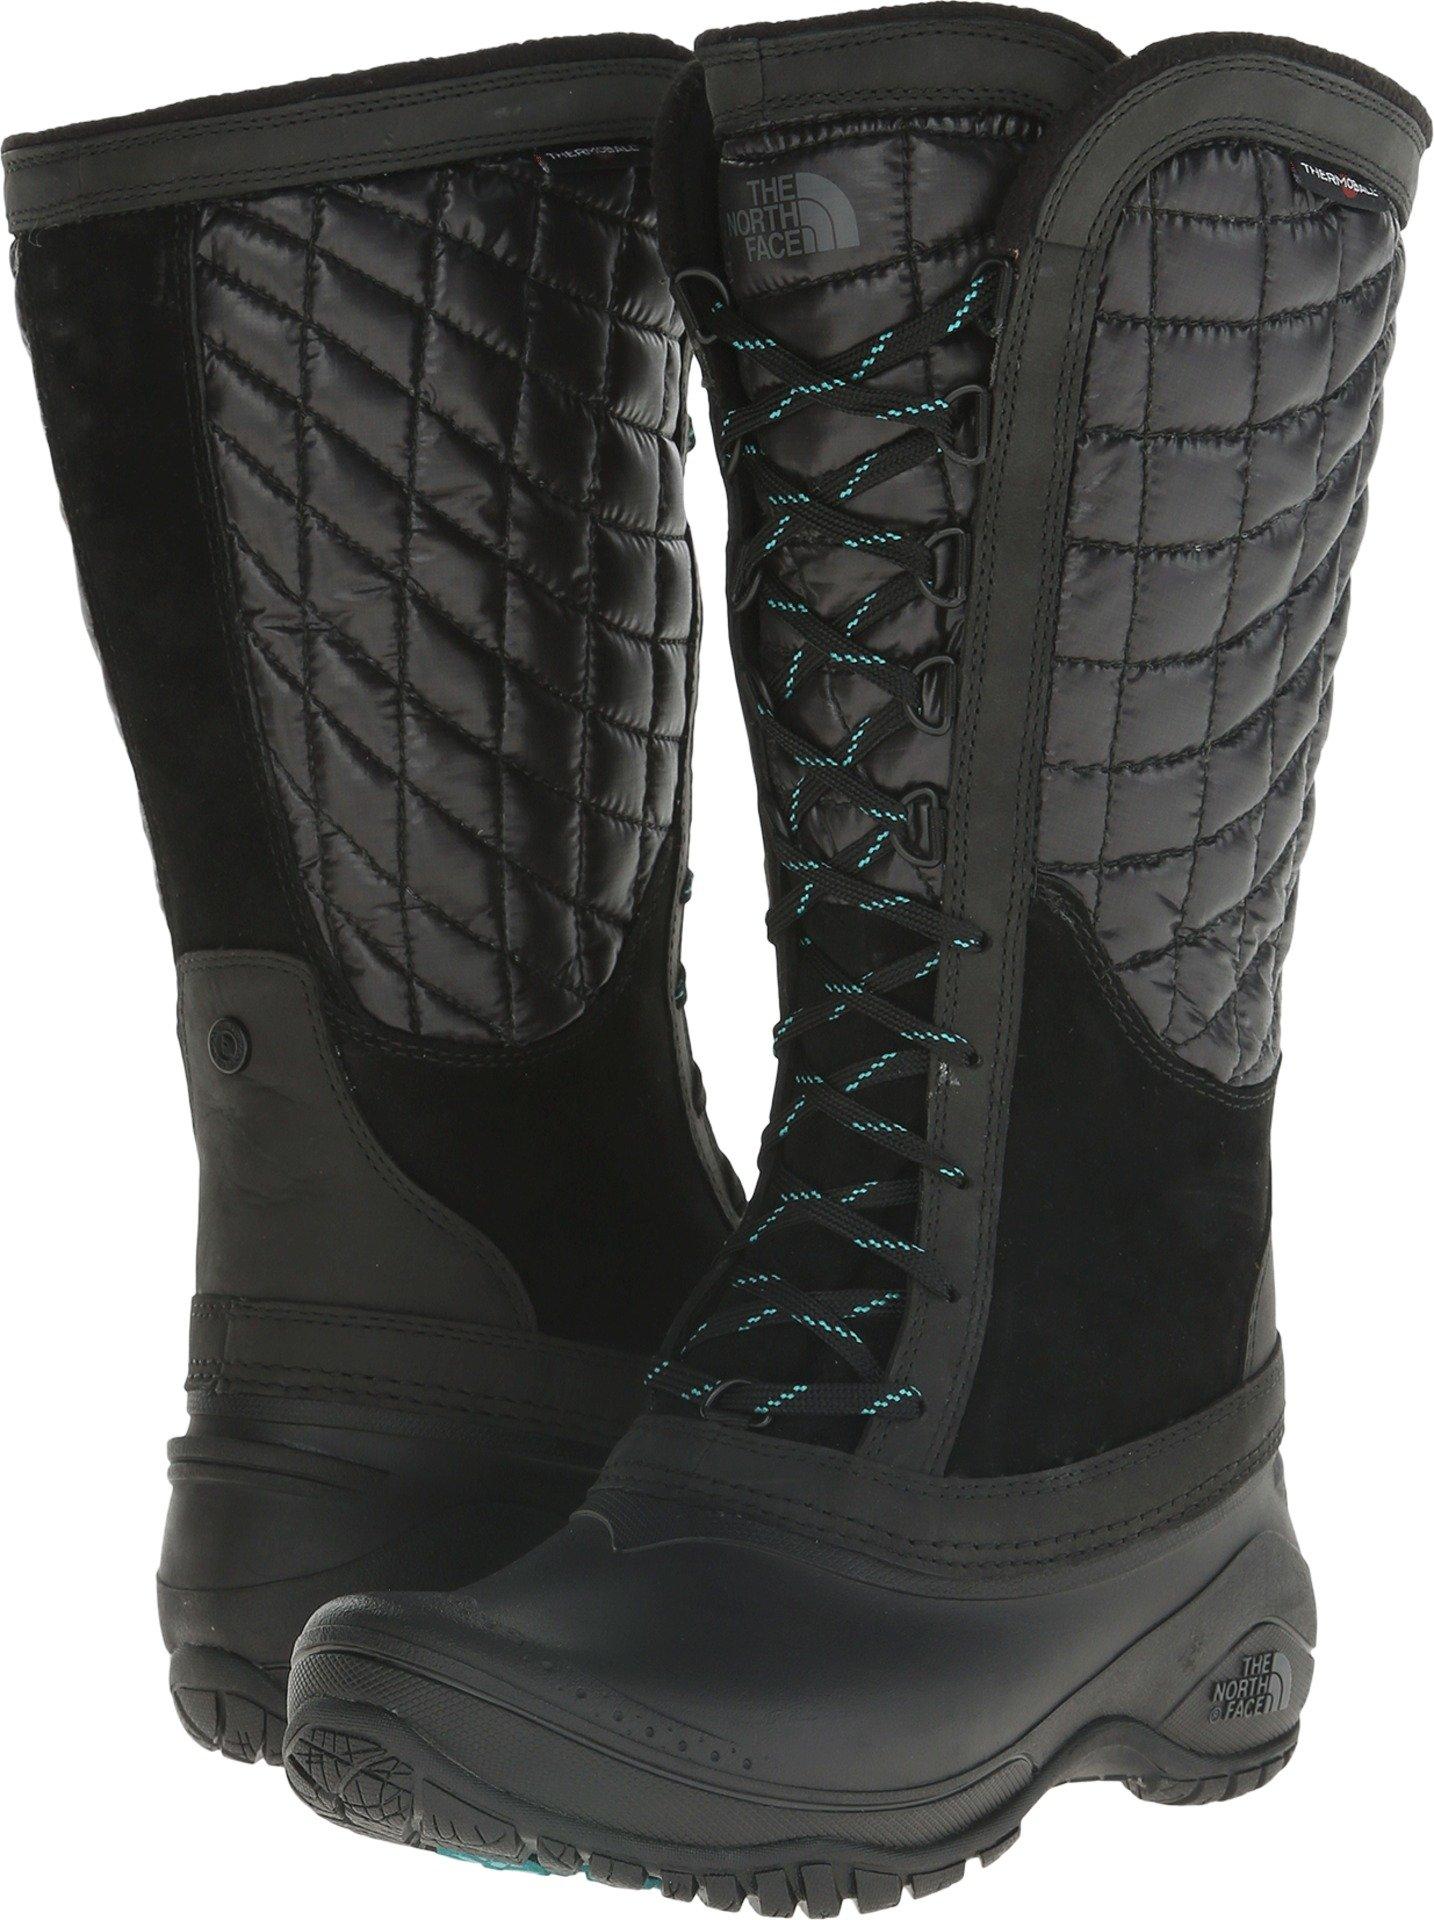 The North Face Thermoball Utility Boot Women's TNF Black/Kokomo Green 9.5